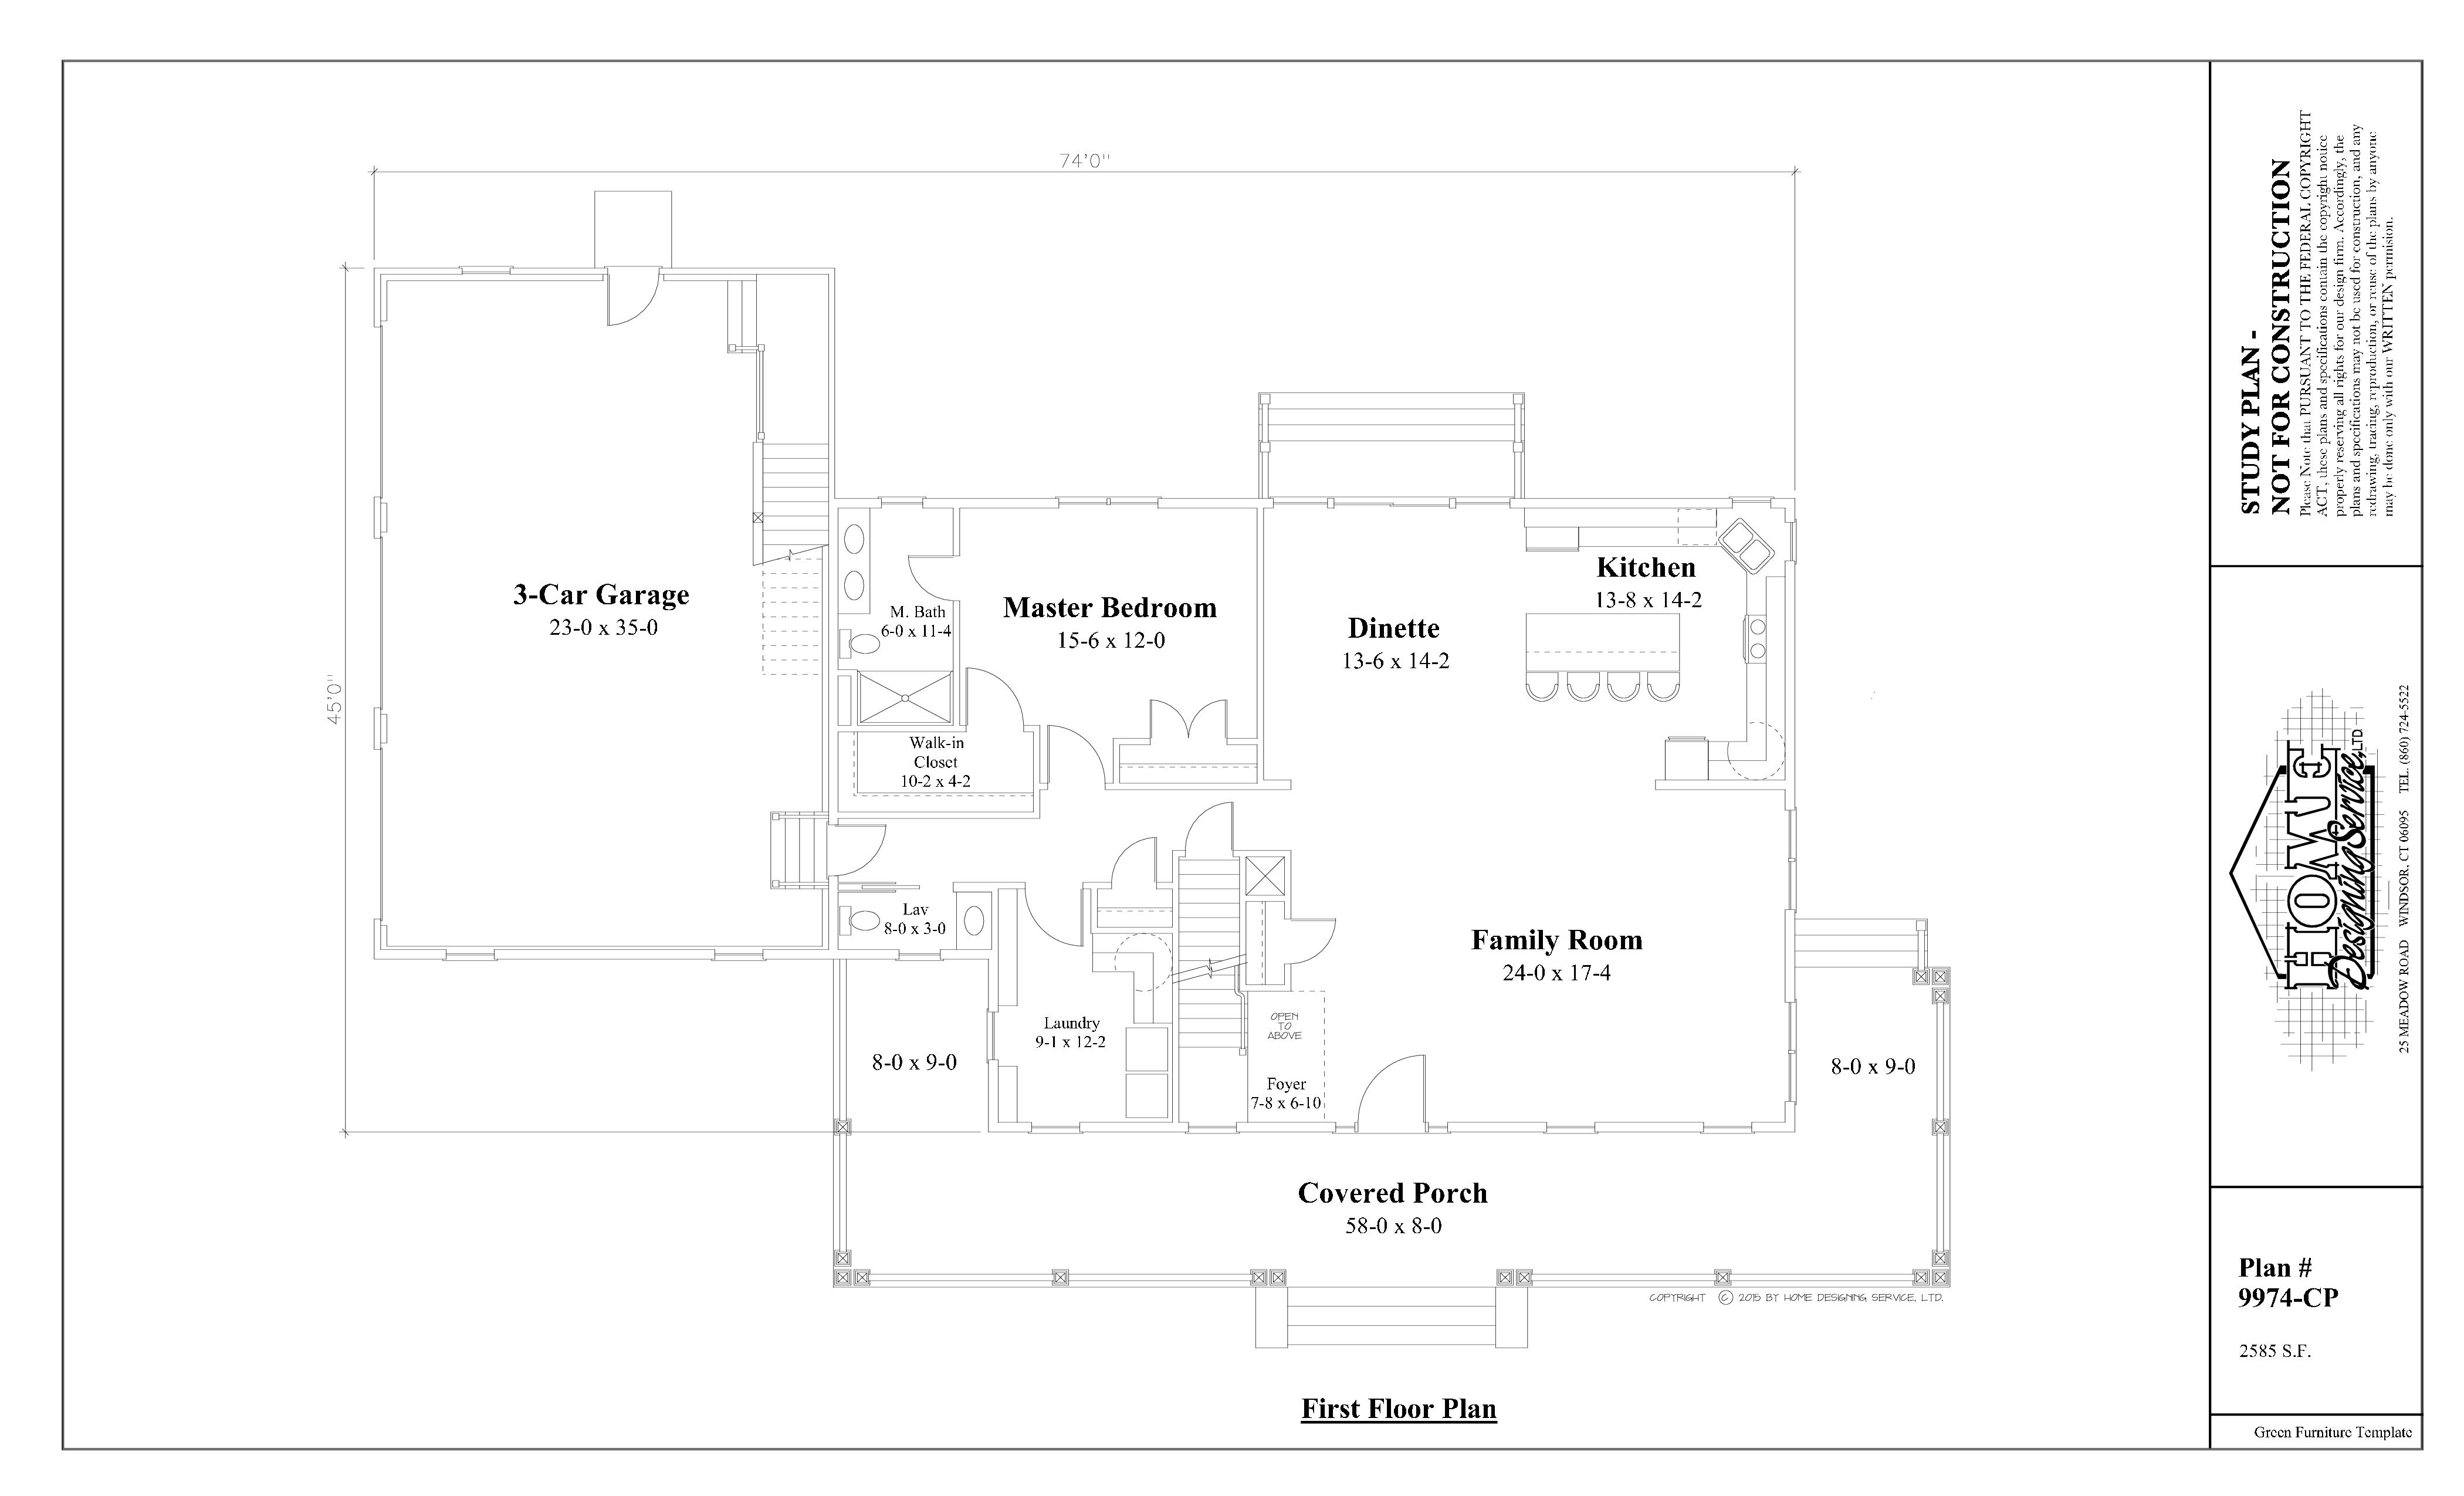 Cape House Plan 9974-cp